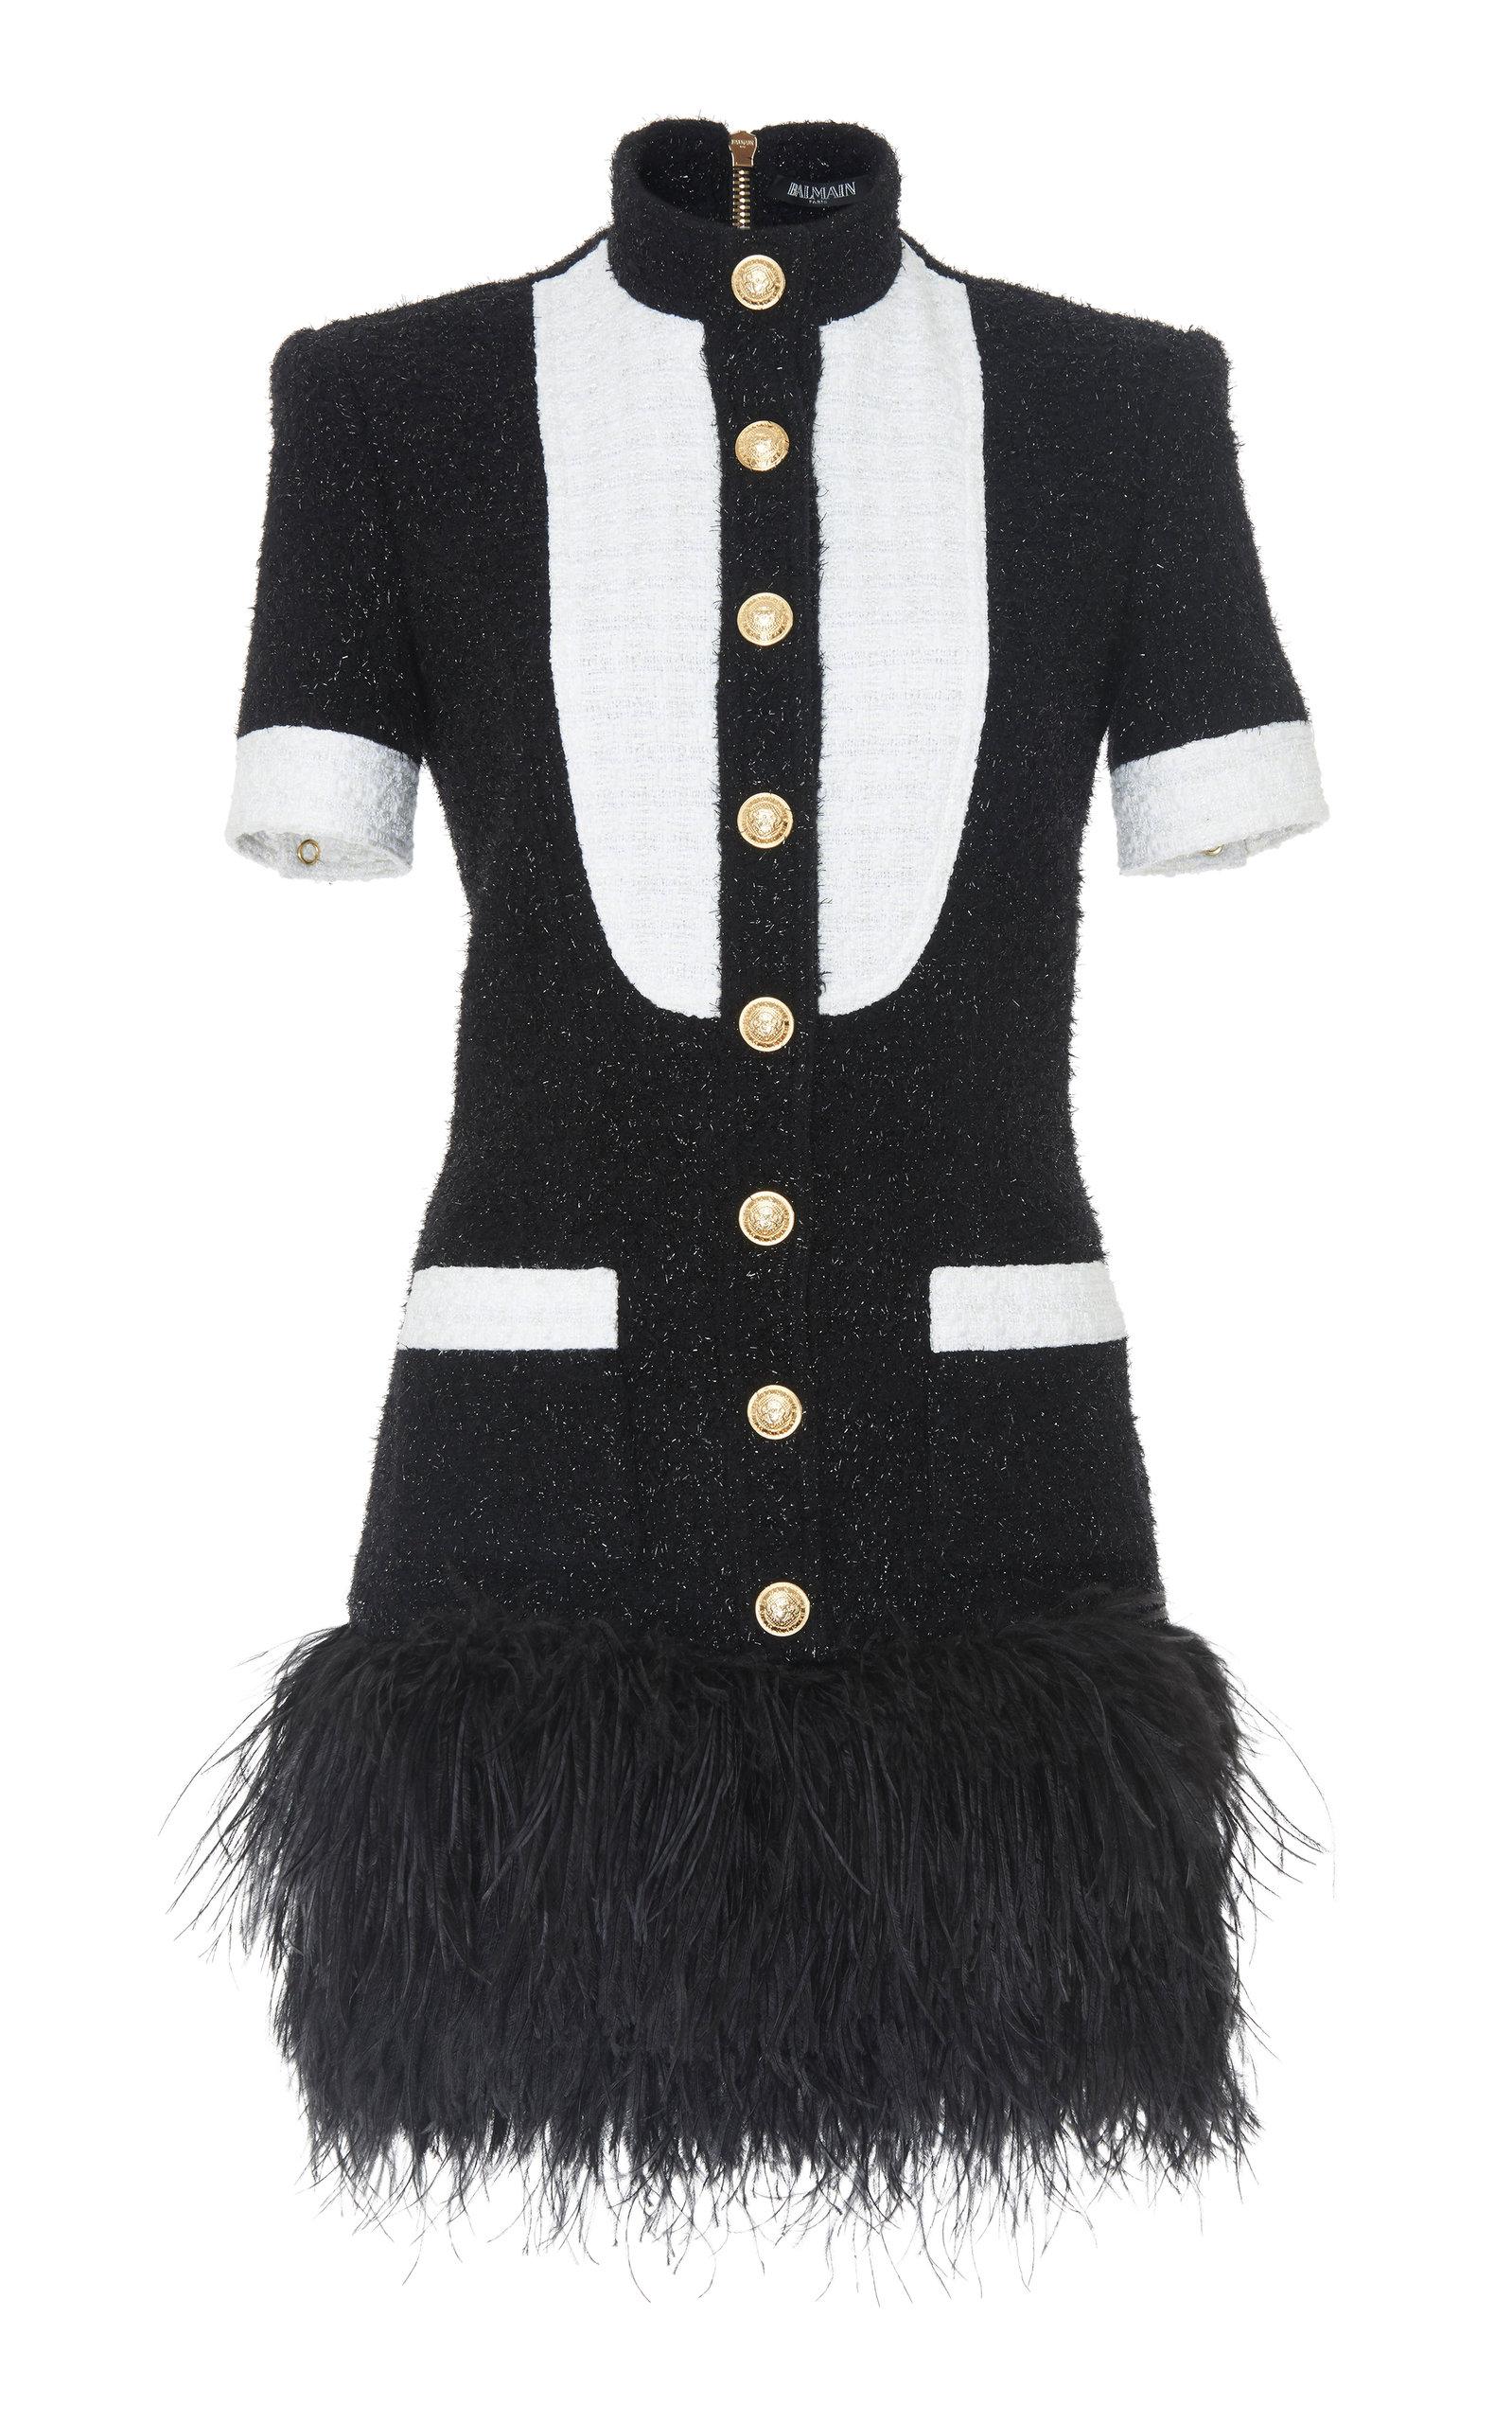 Feather-Trimmed Metallic Wool-Blend Tweed Mini Dress, Black/White